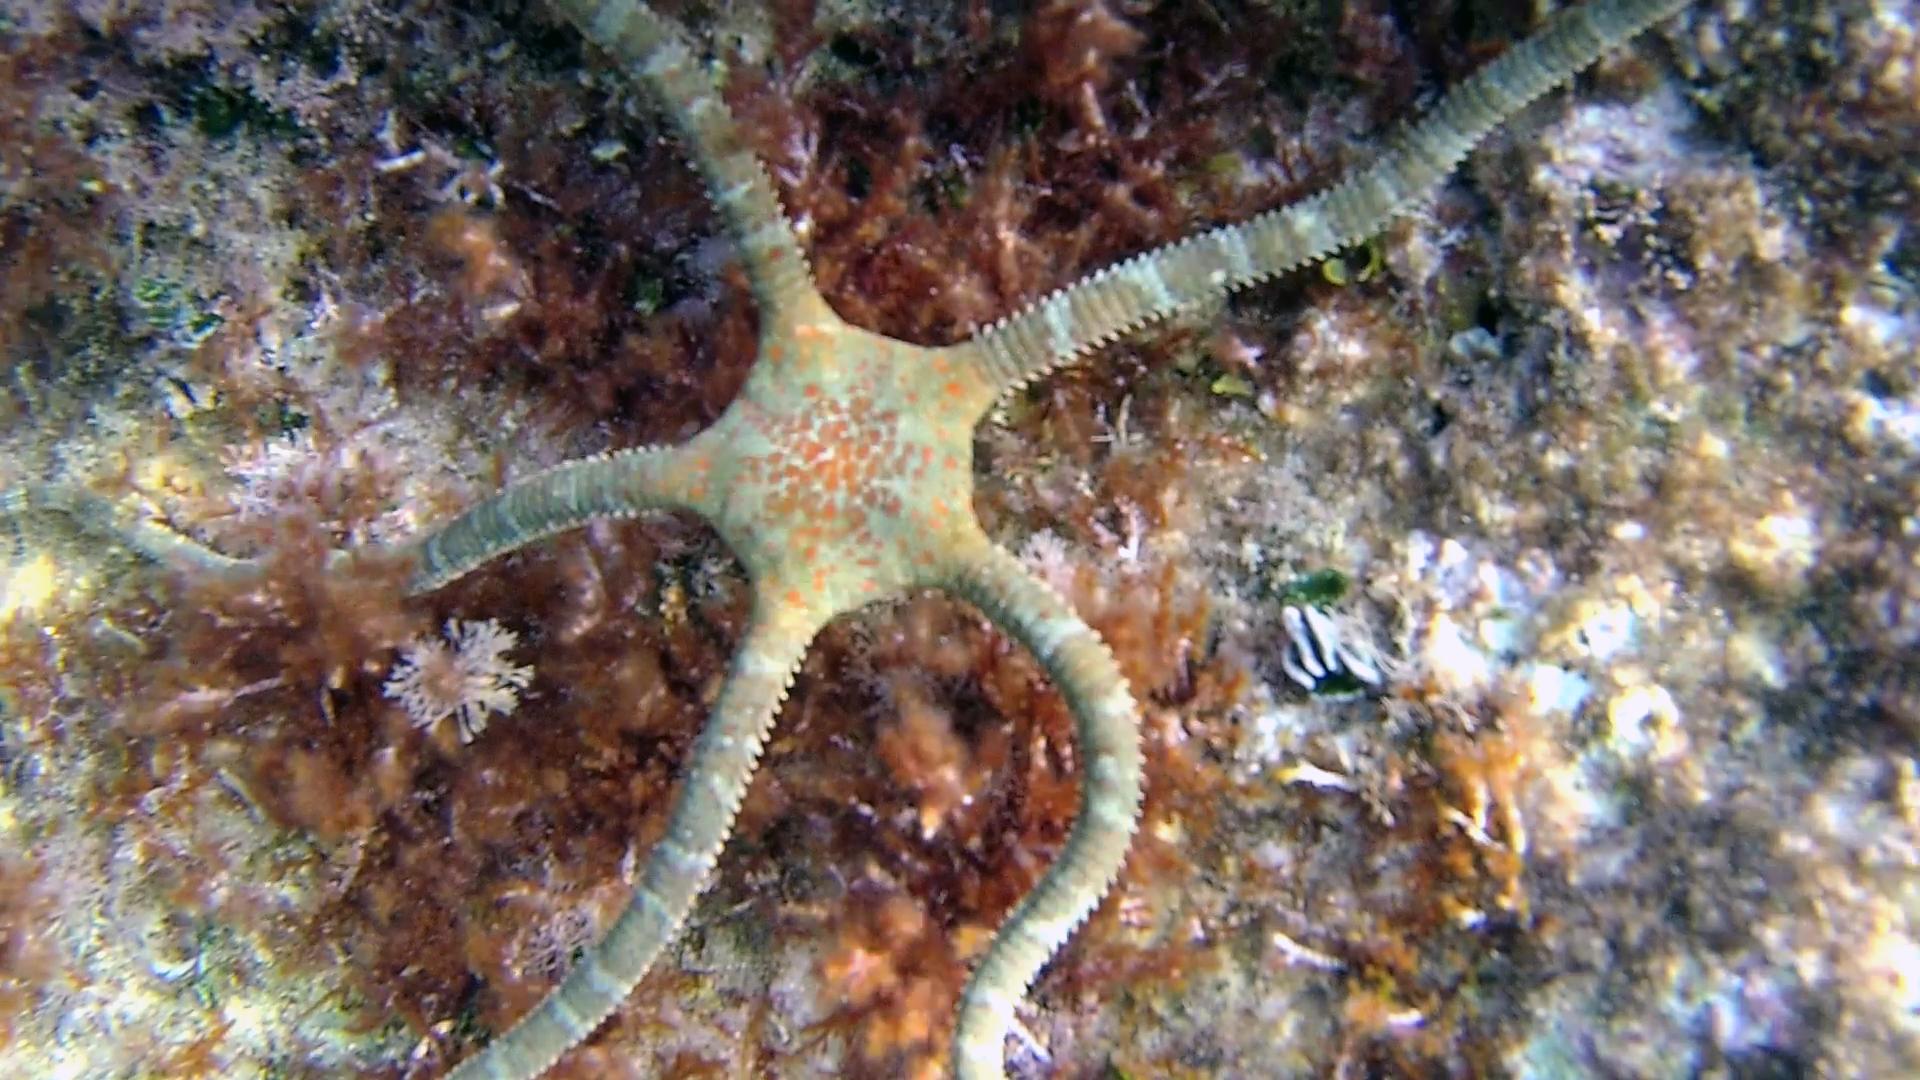 Stella Serpentina liscia - Ophioderma longicauda - brittle starfish - intotheblue.it